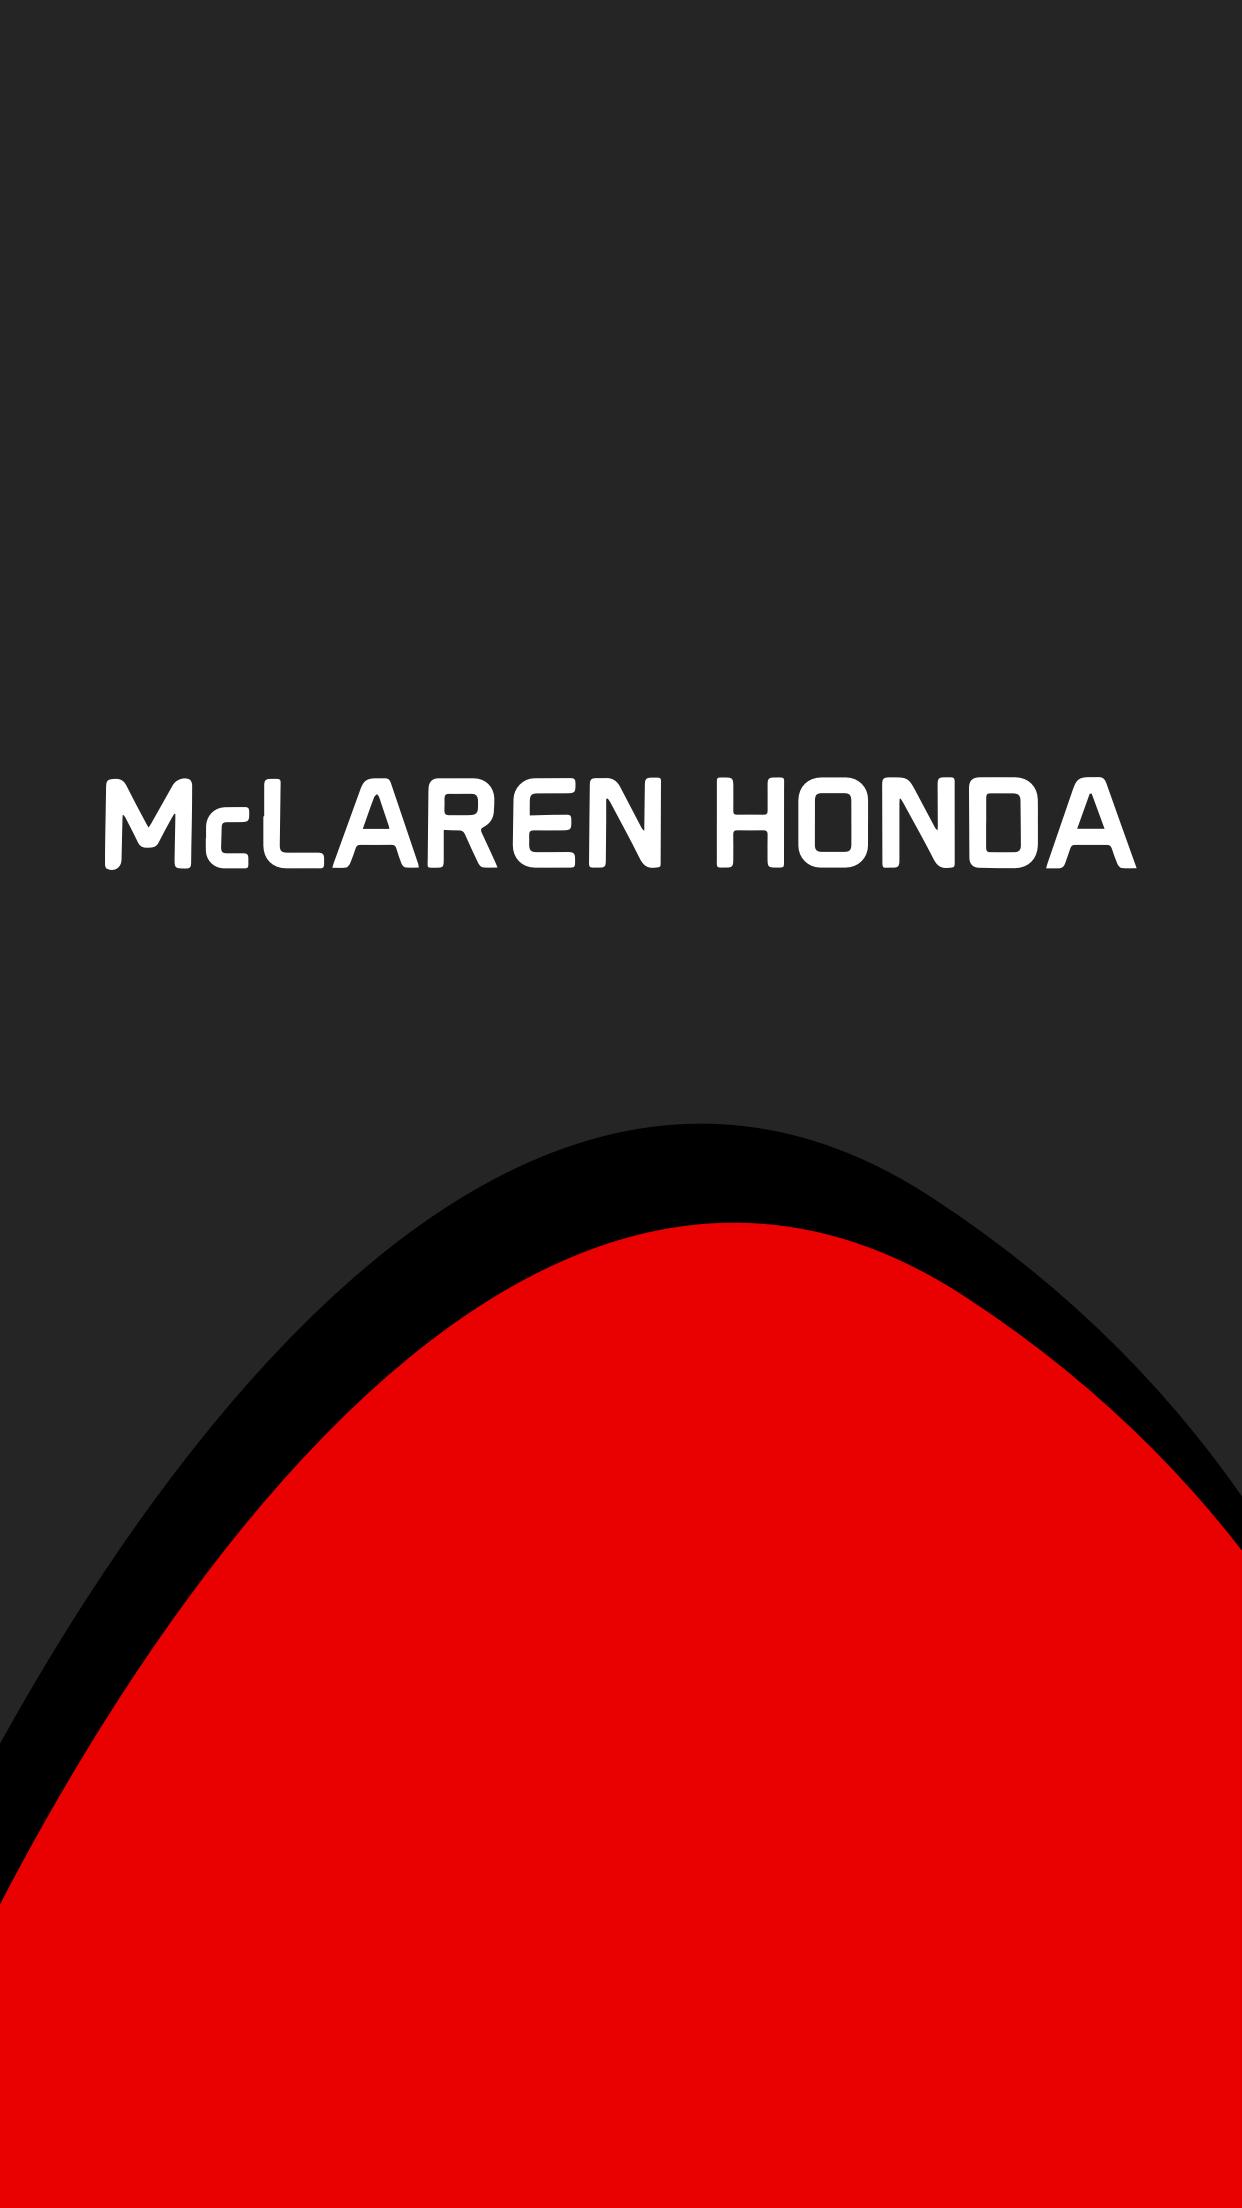 Sfondi vodafone logo